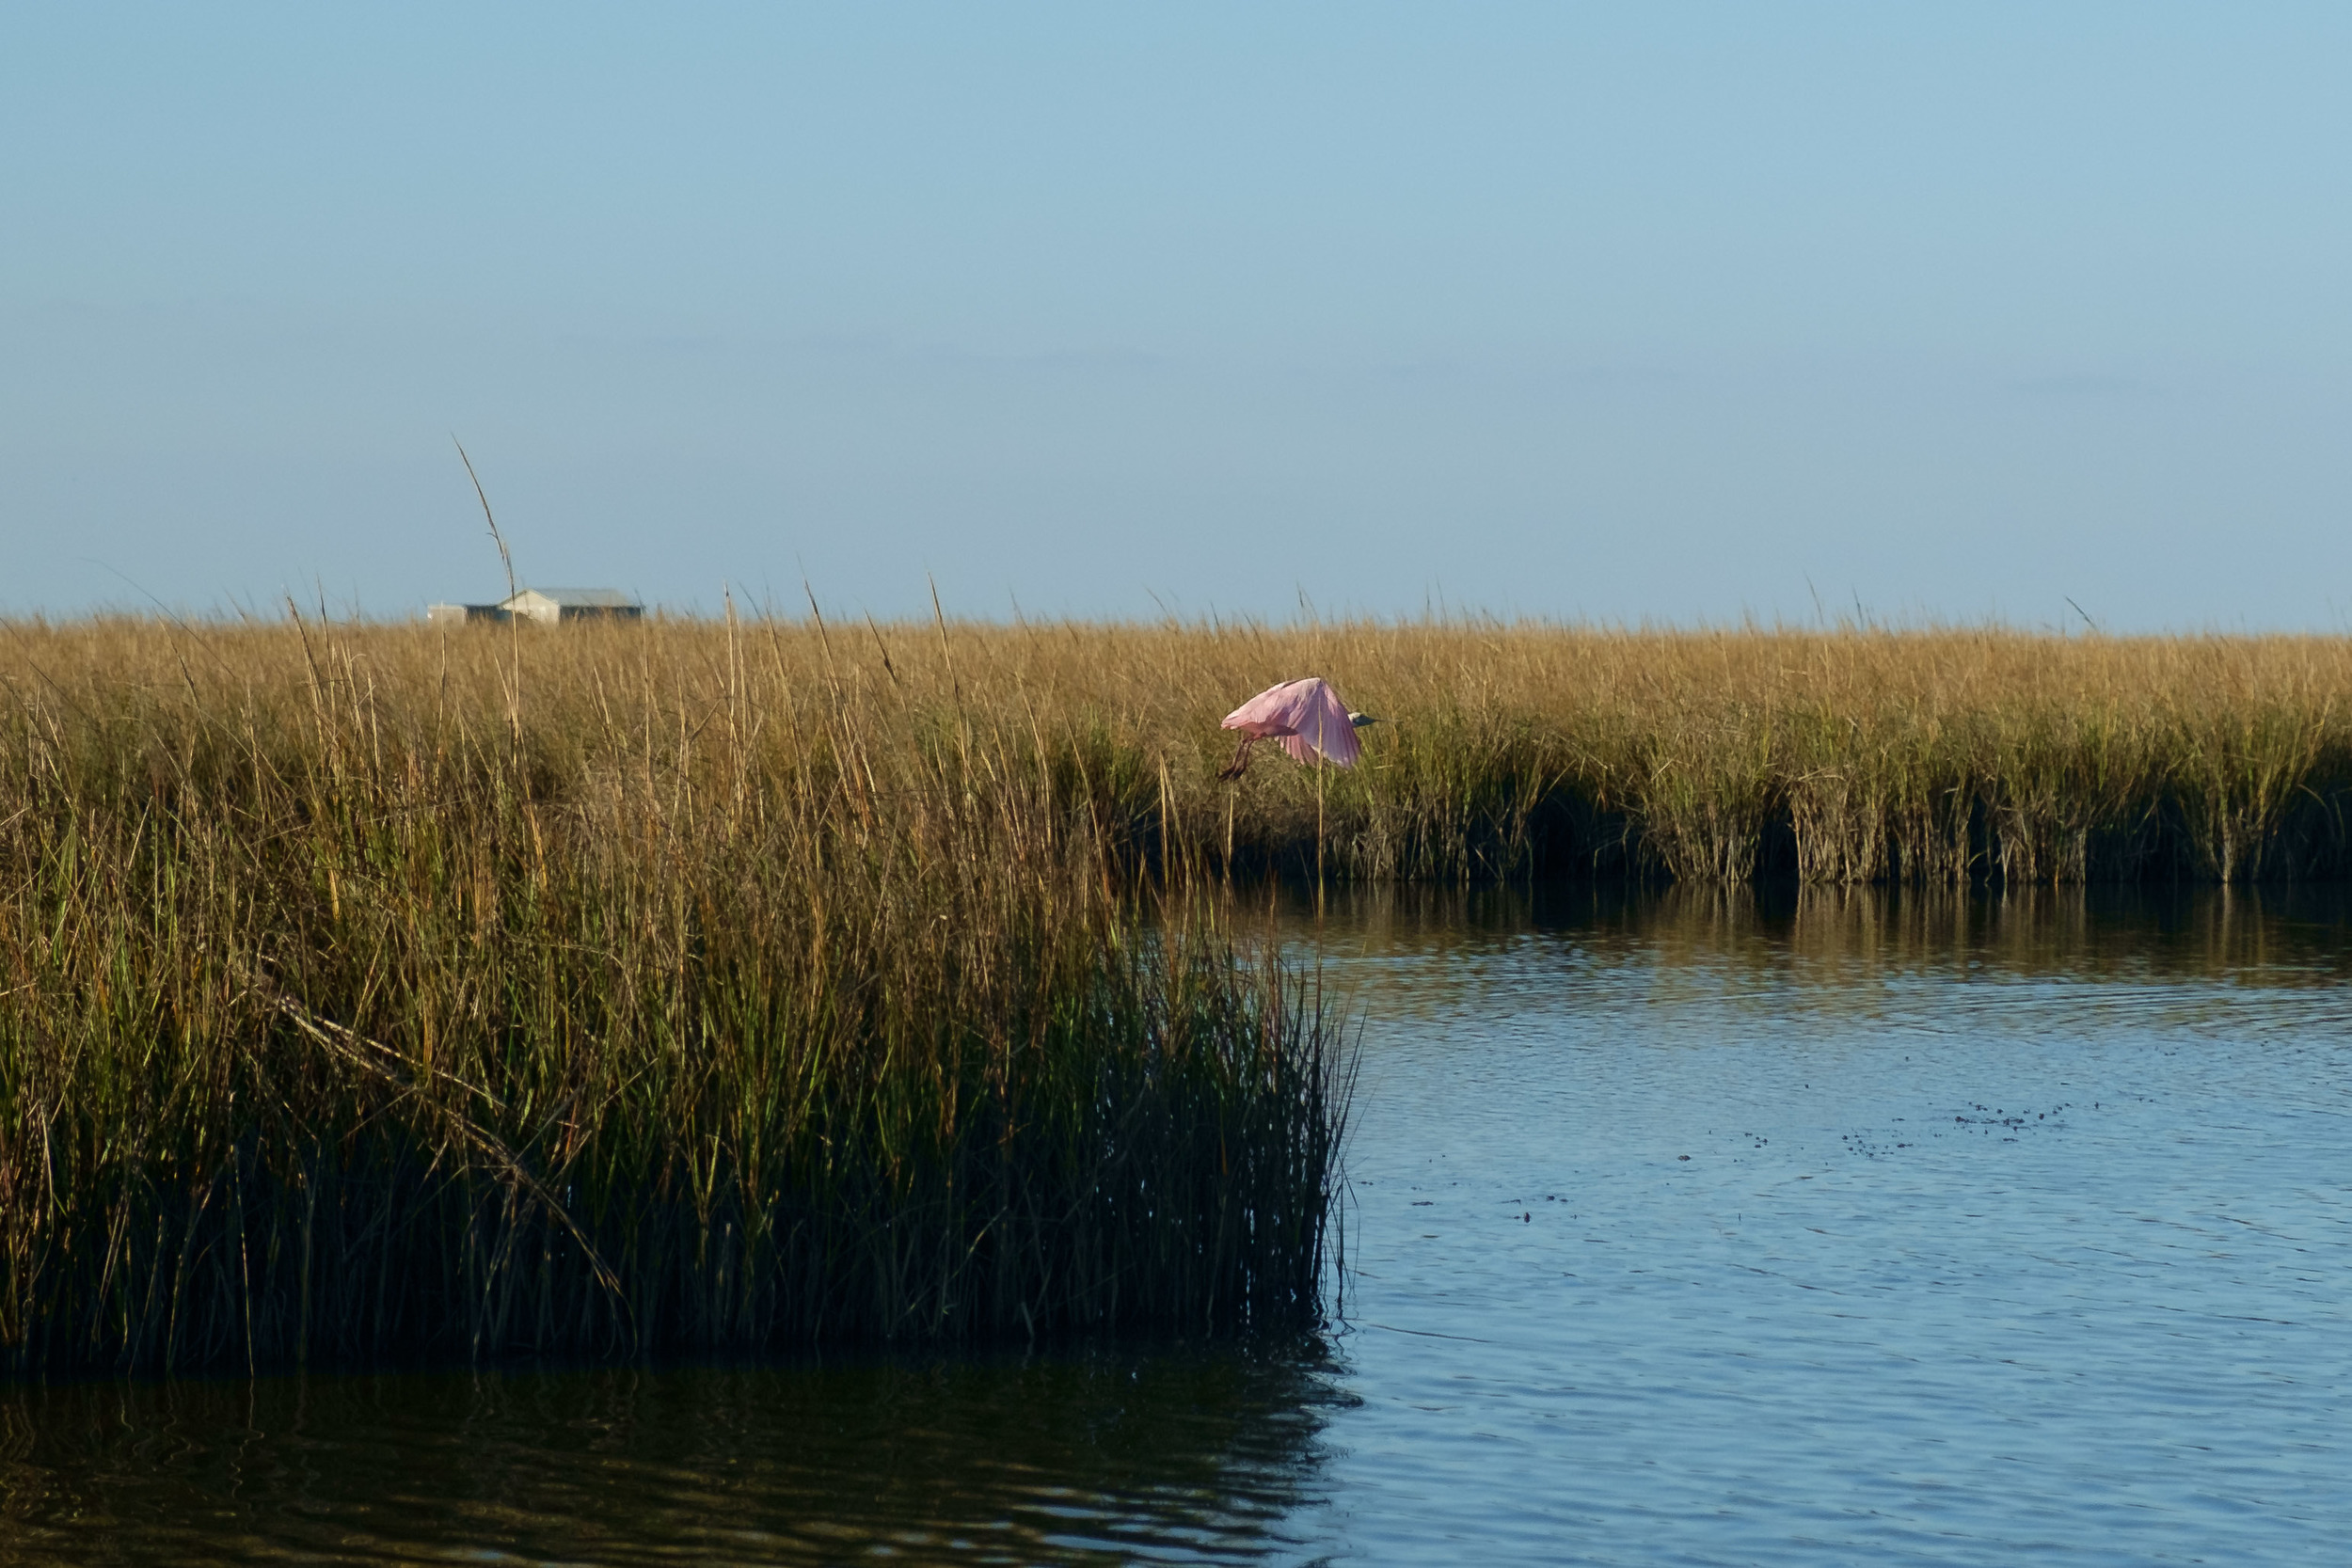 Almost got a great shot of a Roseate Spoonbill (Cajun Flamingo). Quite a few were around.